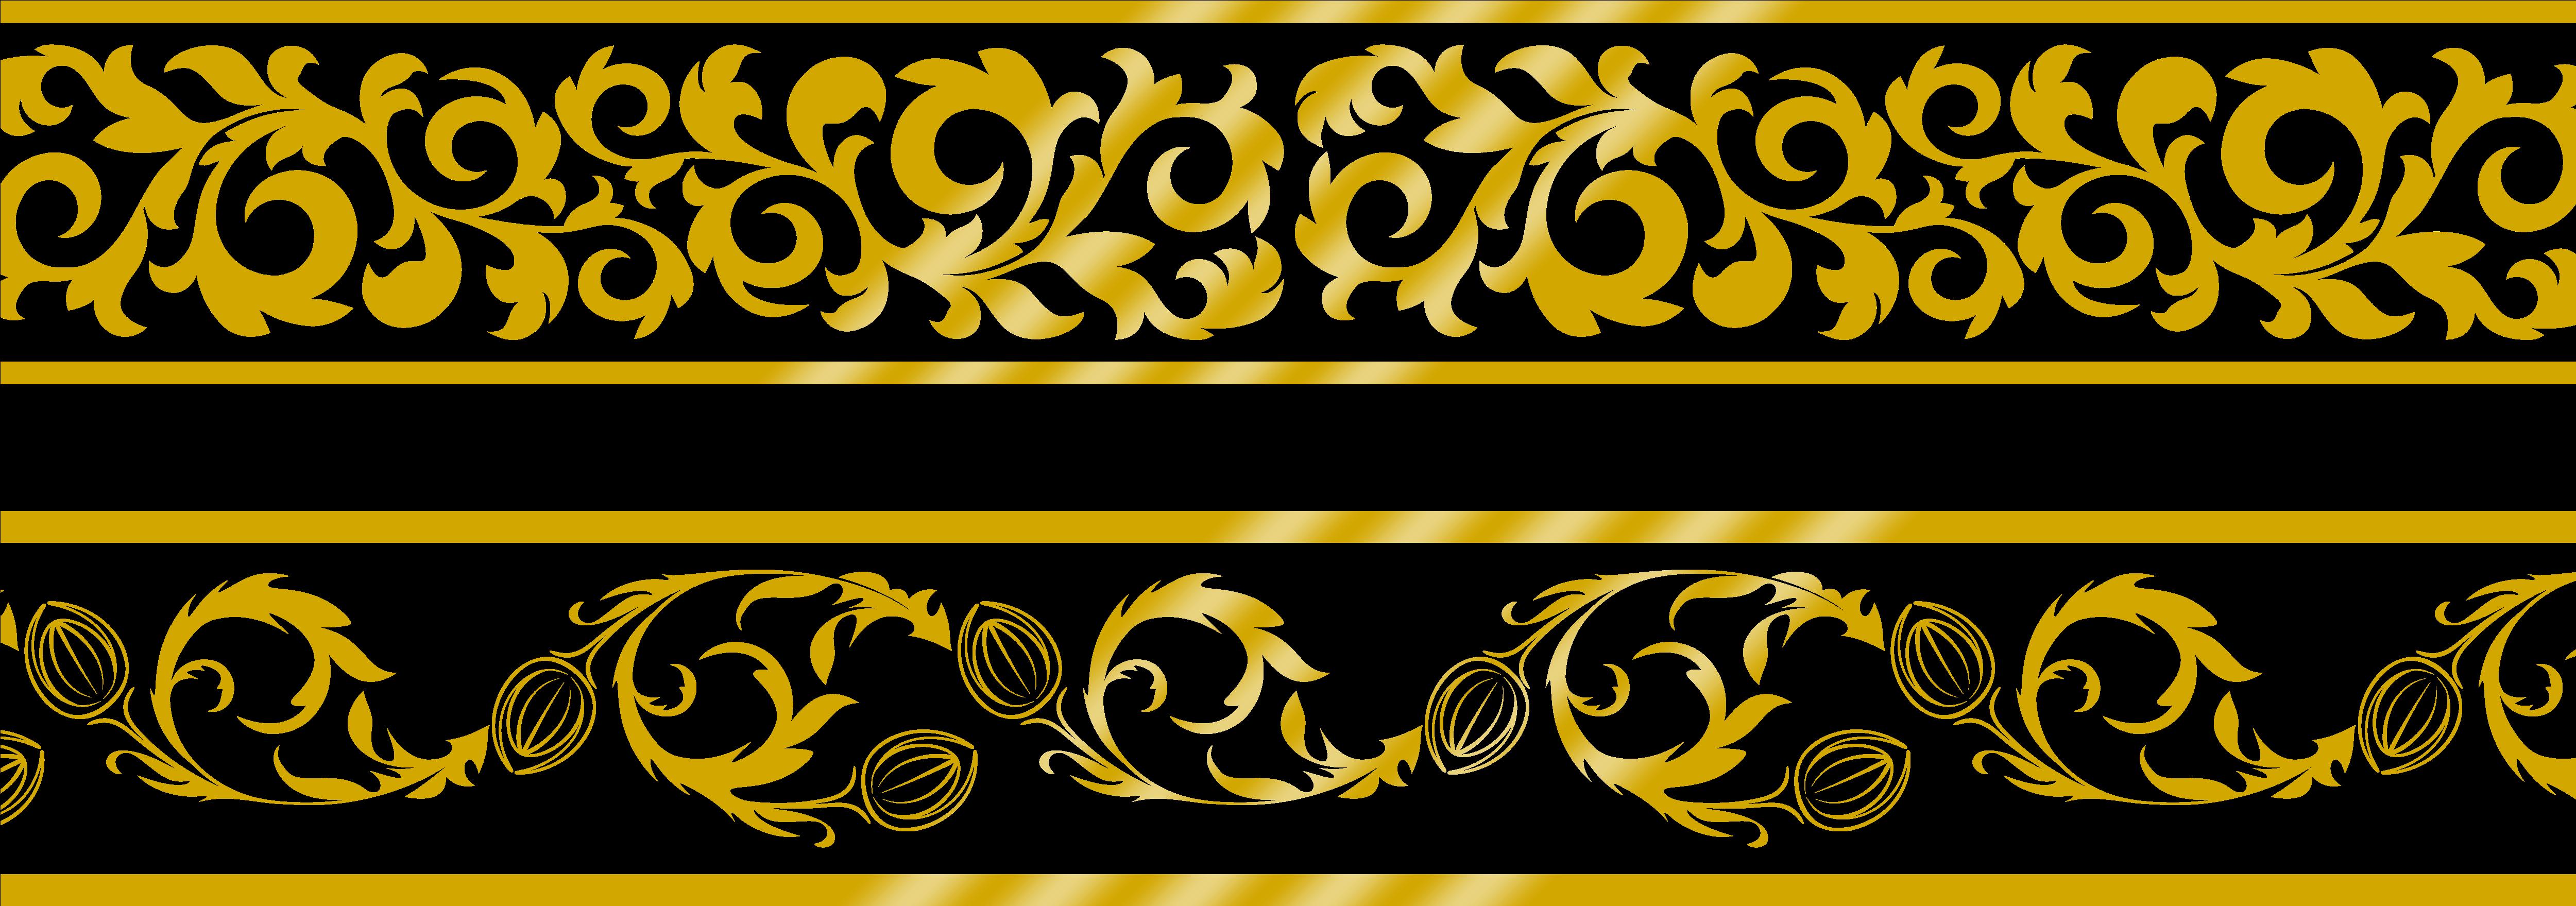 Transparent gold lace clipart - Border Gold Png - Lace Golden Border Png